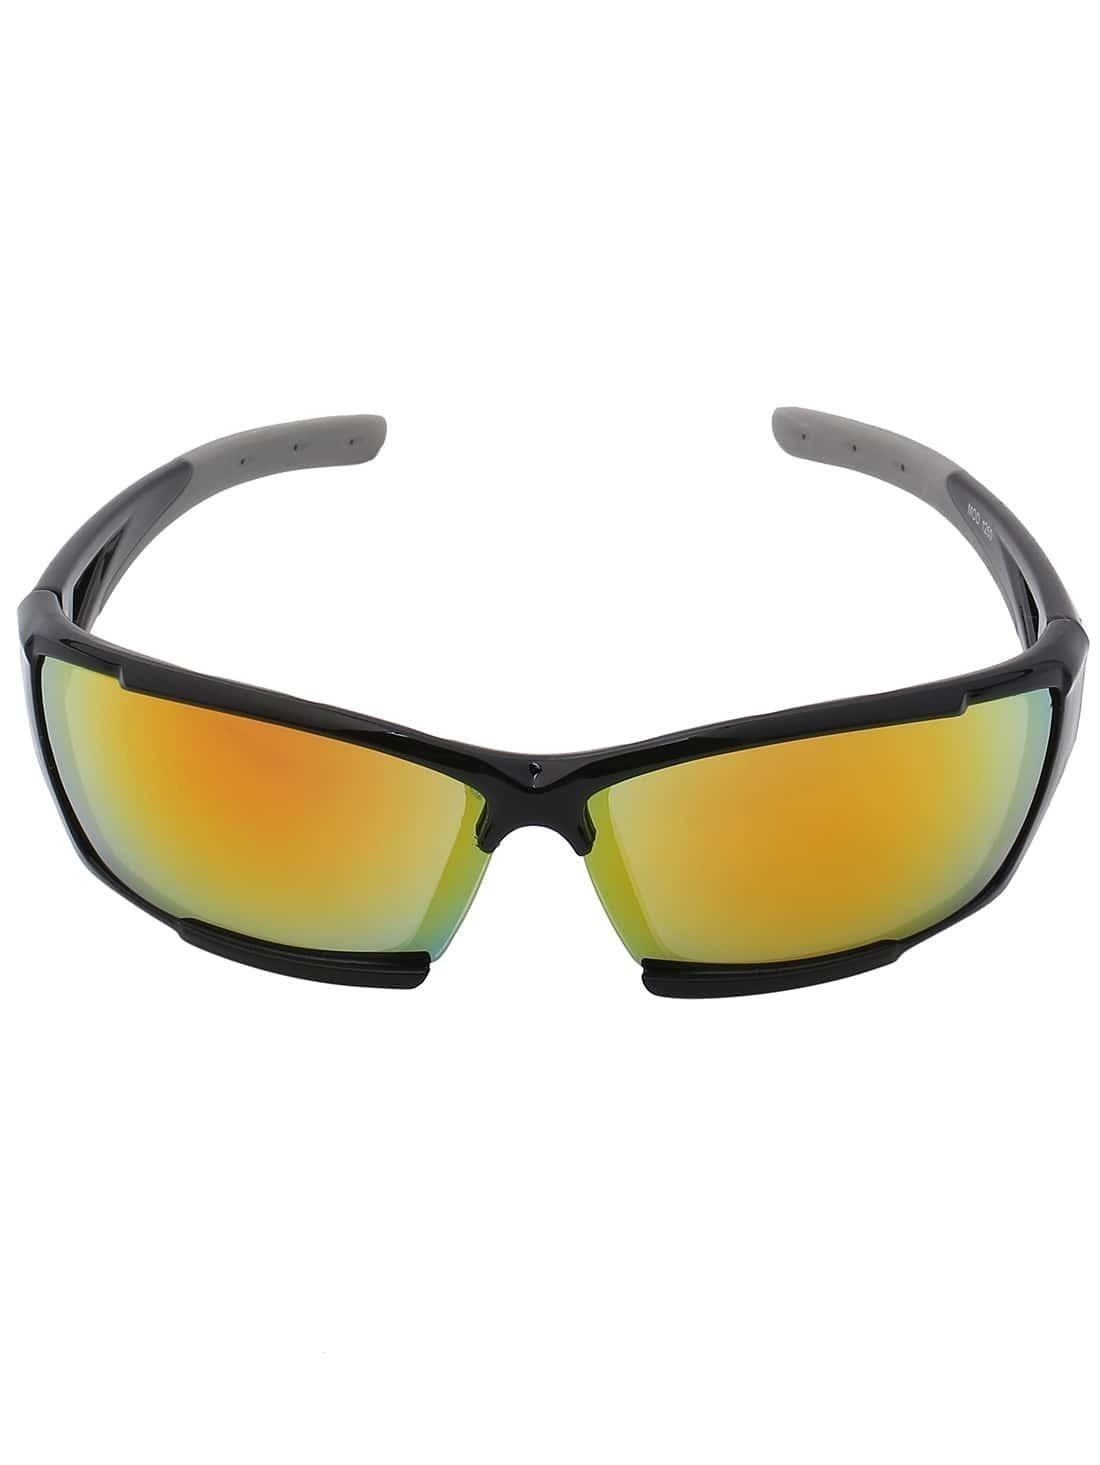 Black Frame Fashion Sunglasses -SheIn(Sheinside)